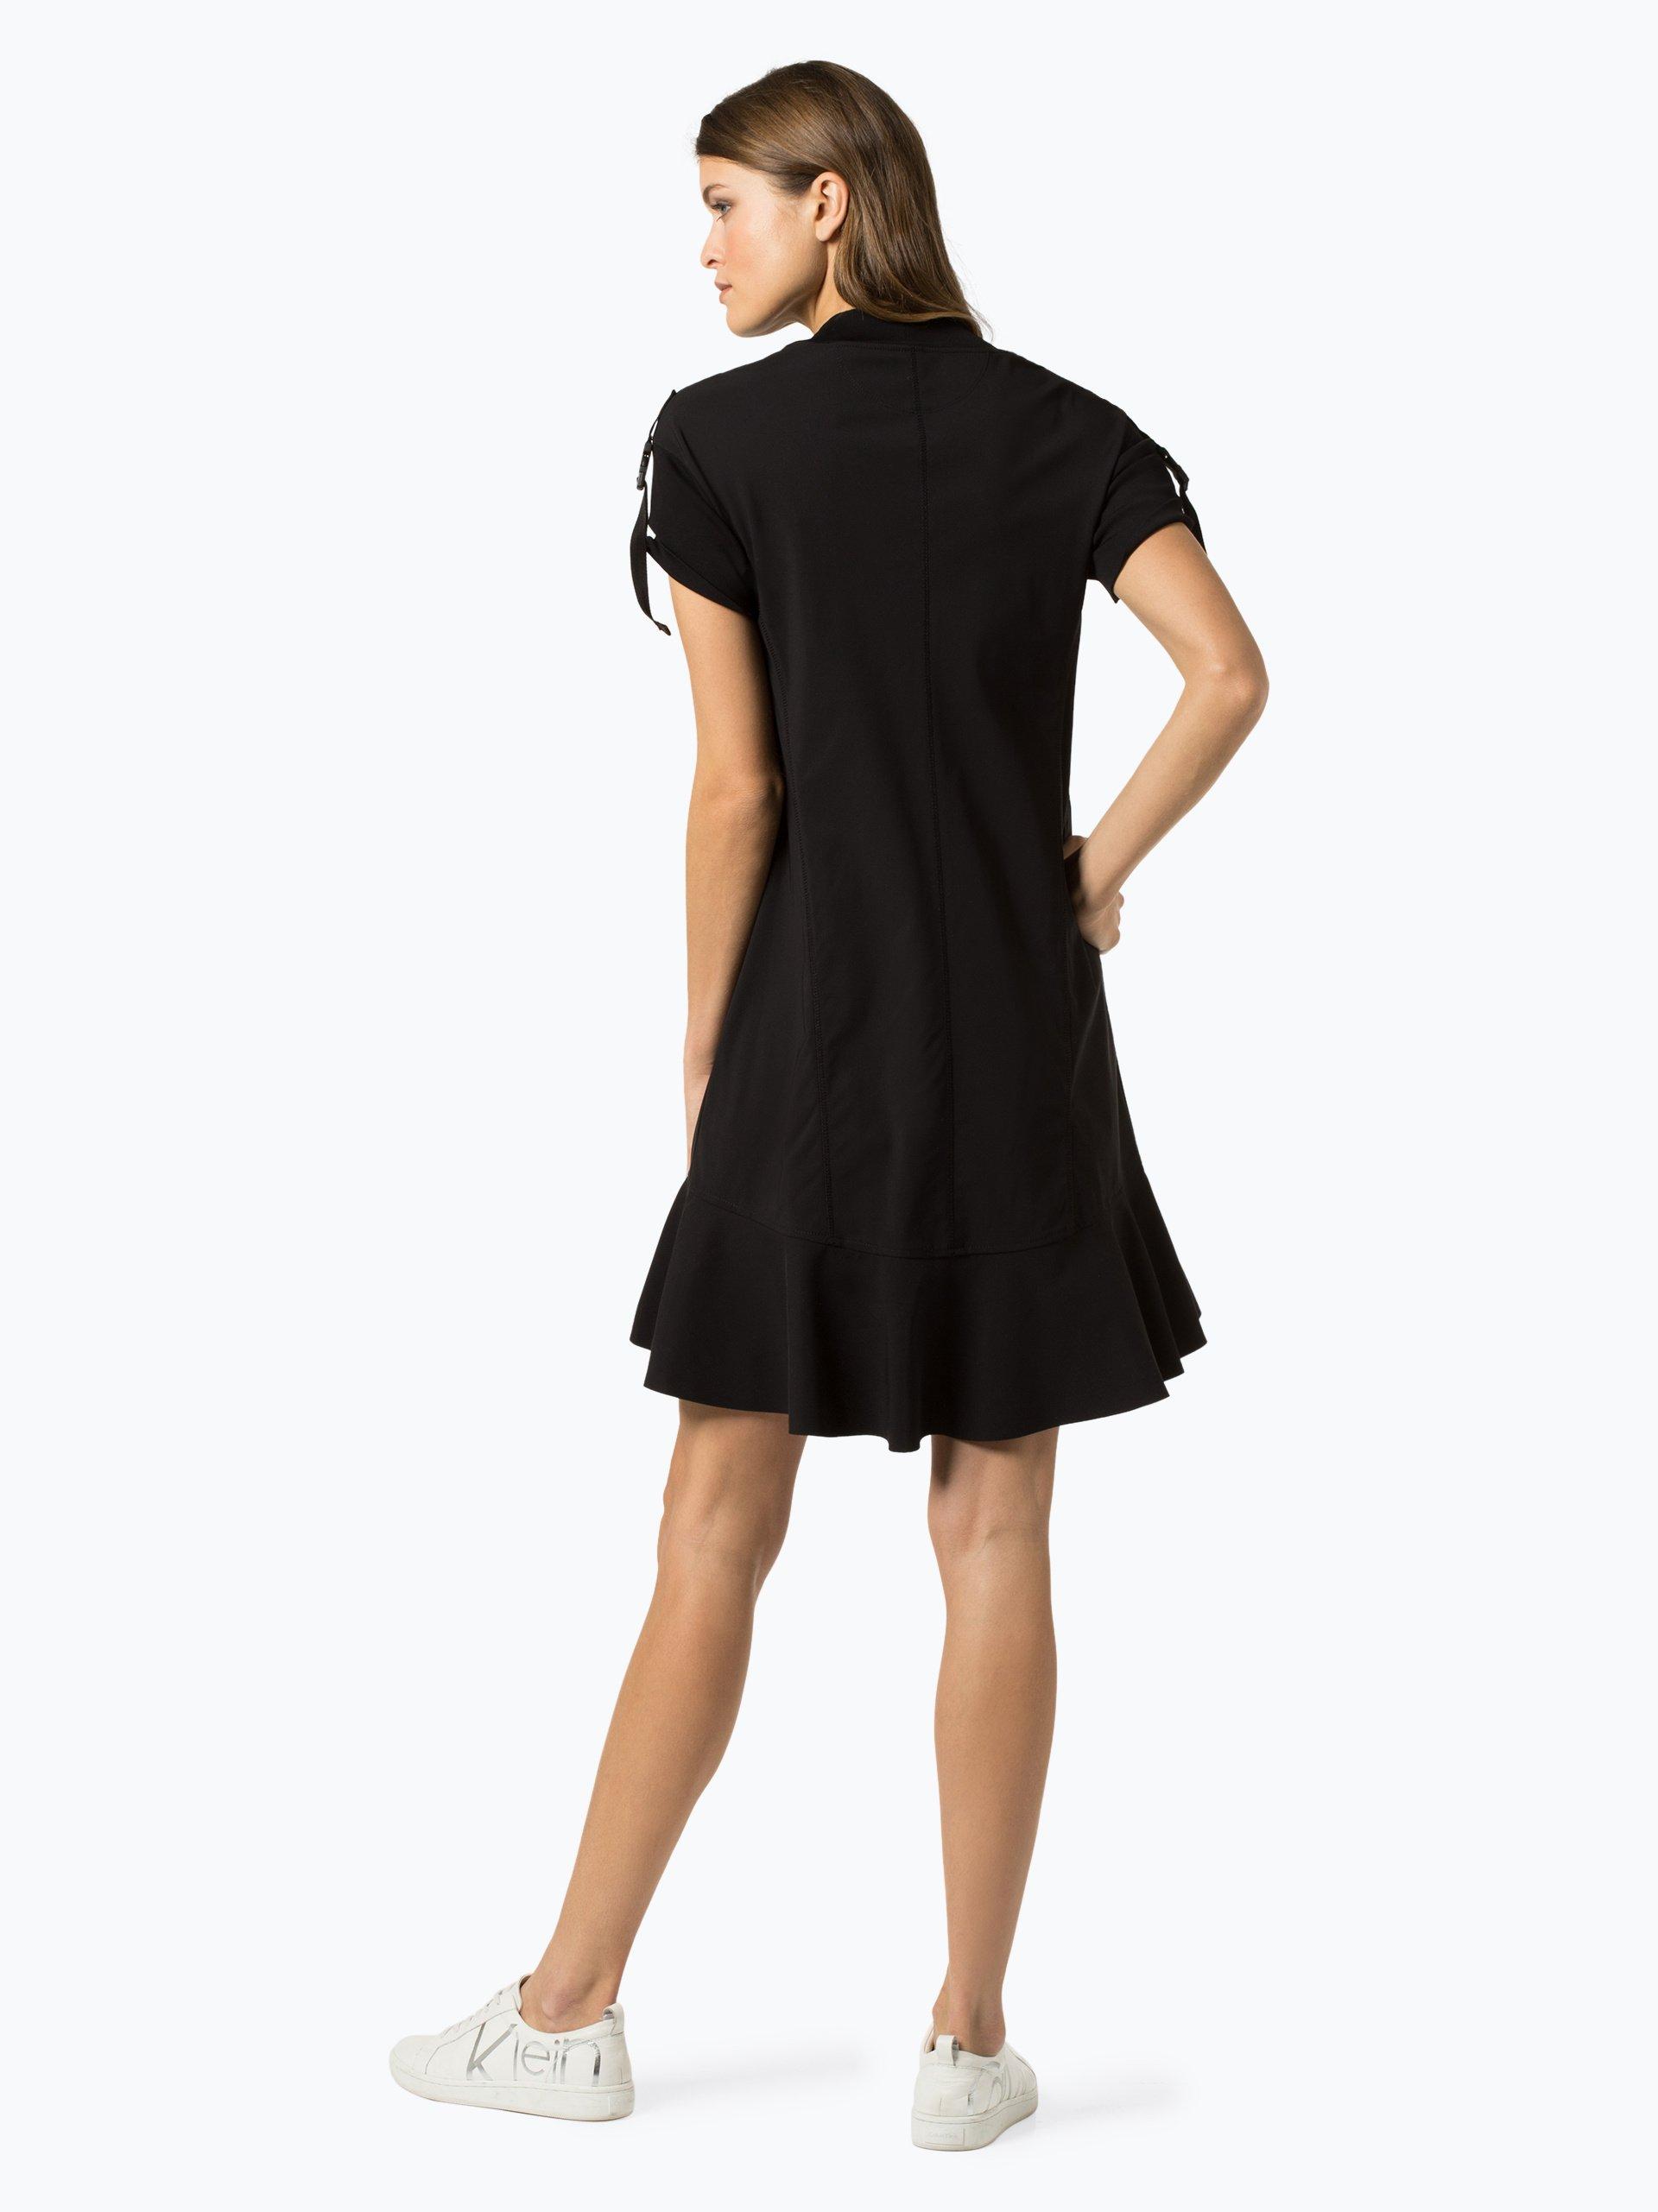 Marc Cain Sports Damen Kleid